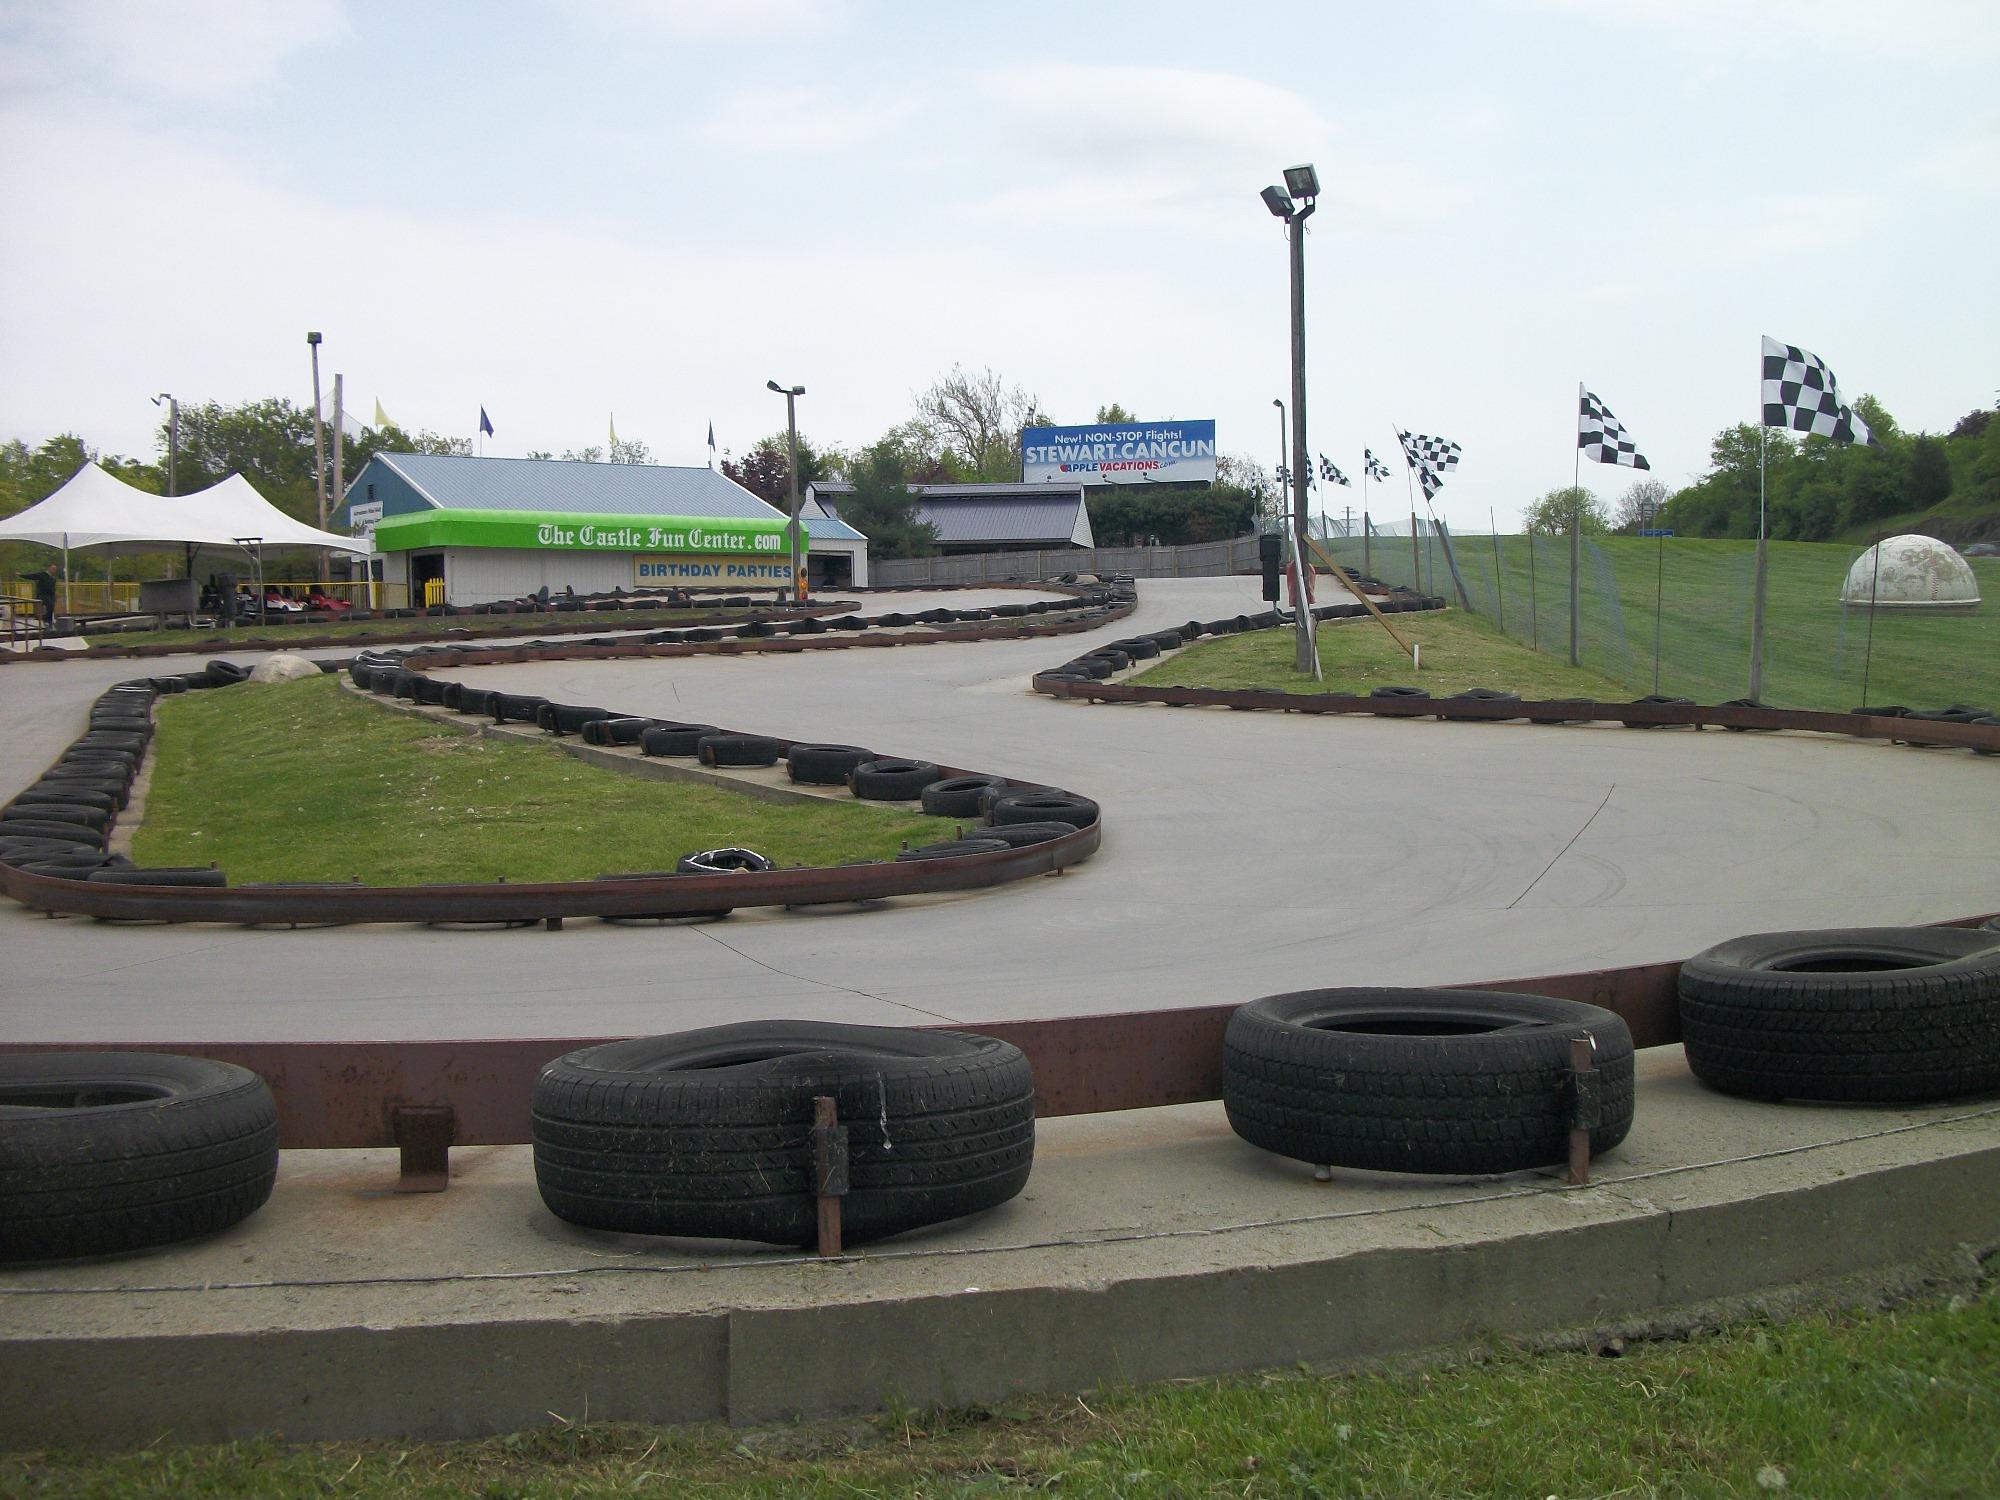 The Castle Fun Center